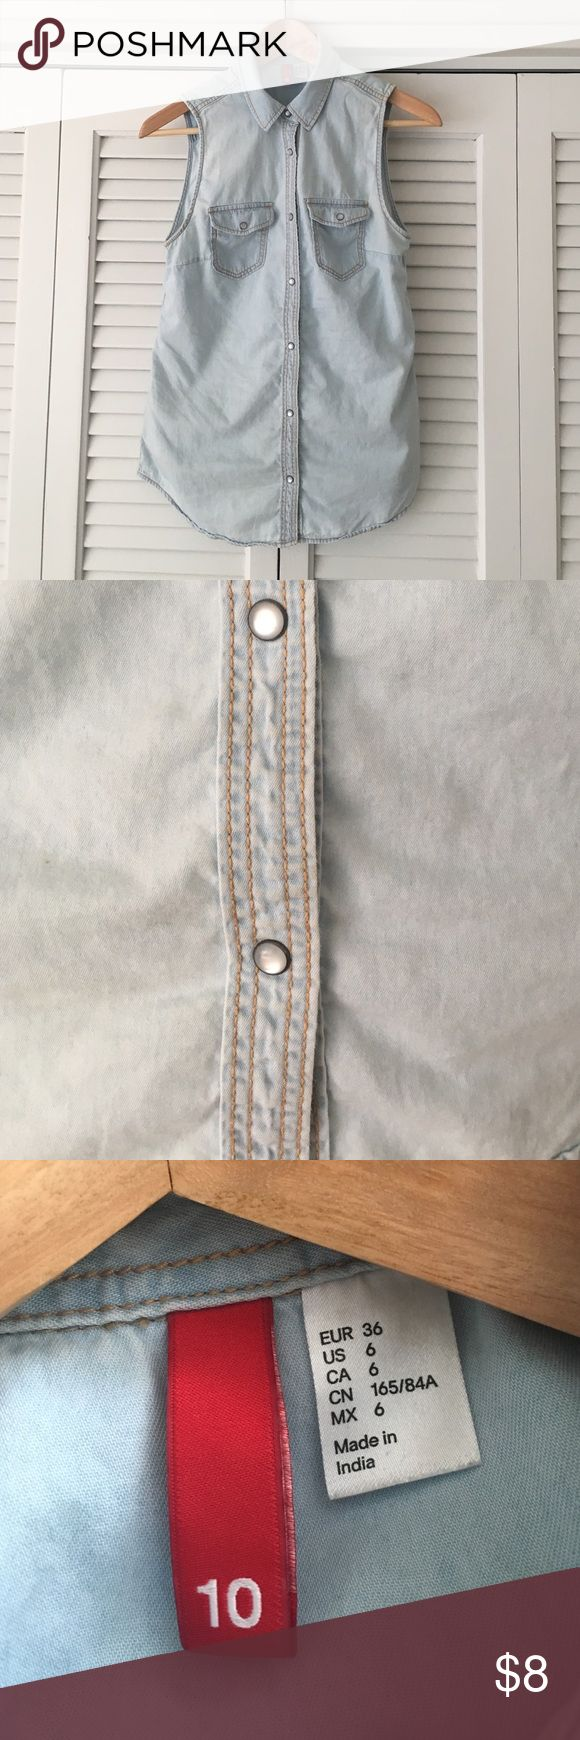 Sleeveless denim shirt. H&M. Light blue denim shirt from H&M. Popper fasteners.  US size 6. H&M Tops